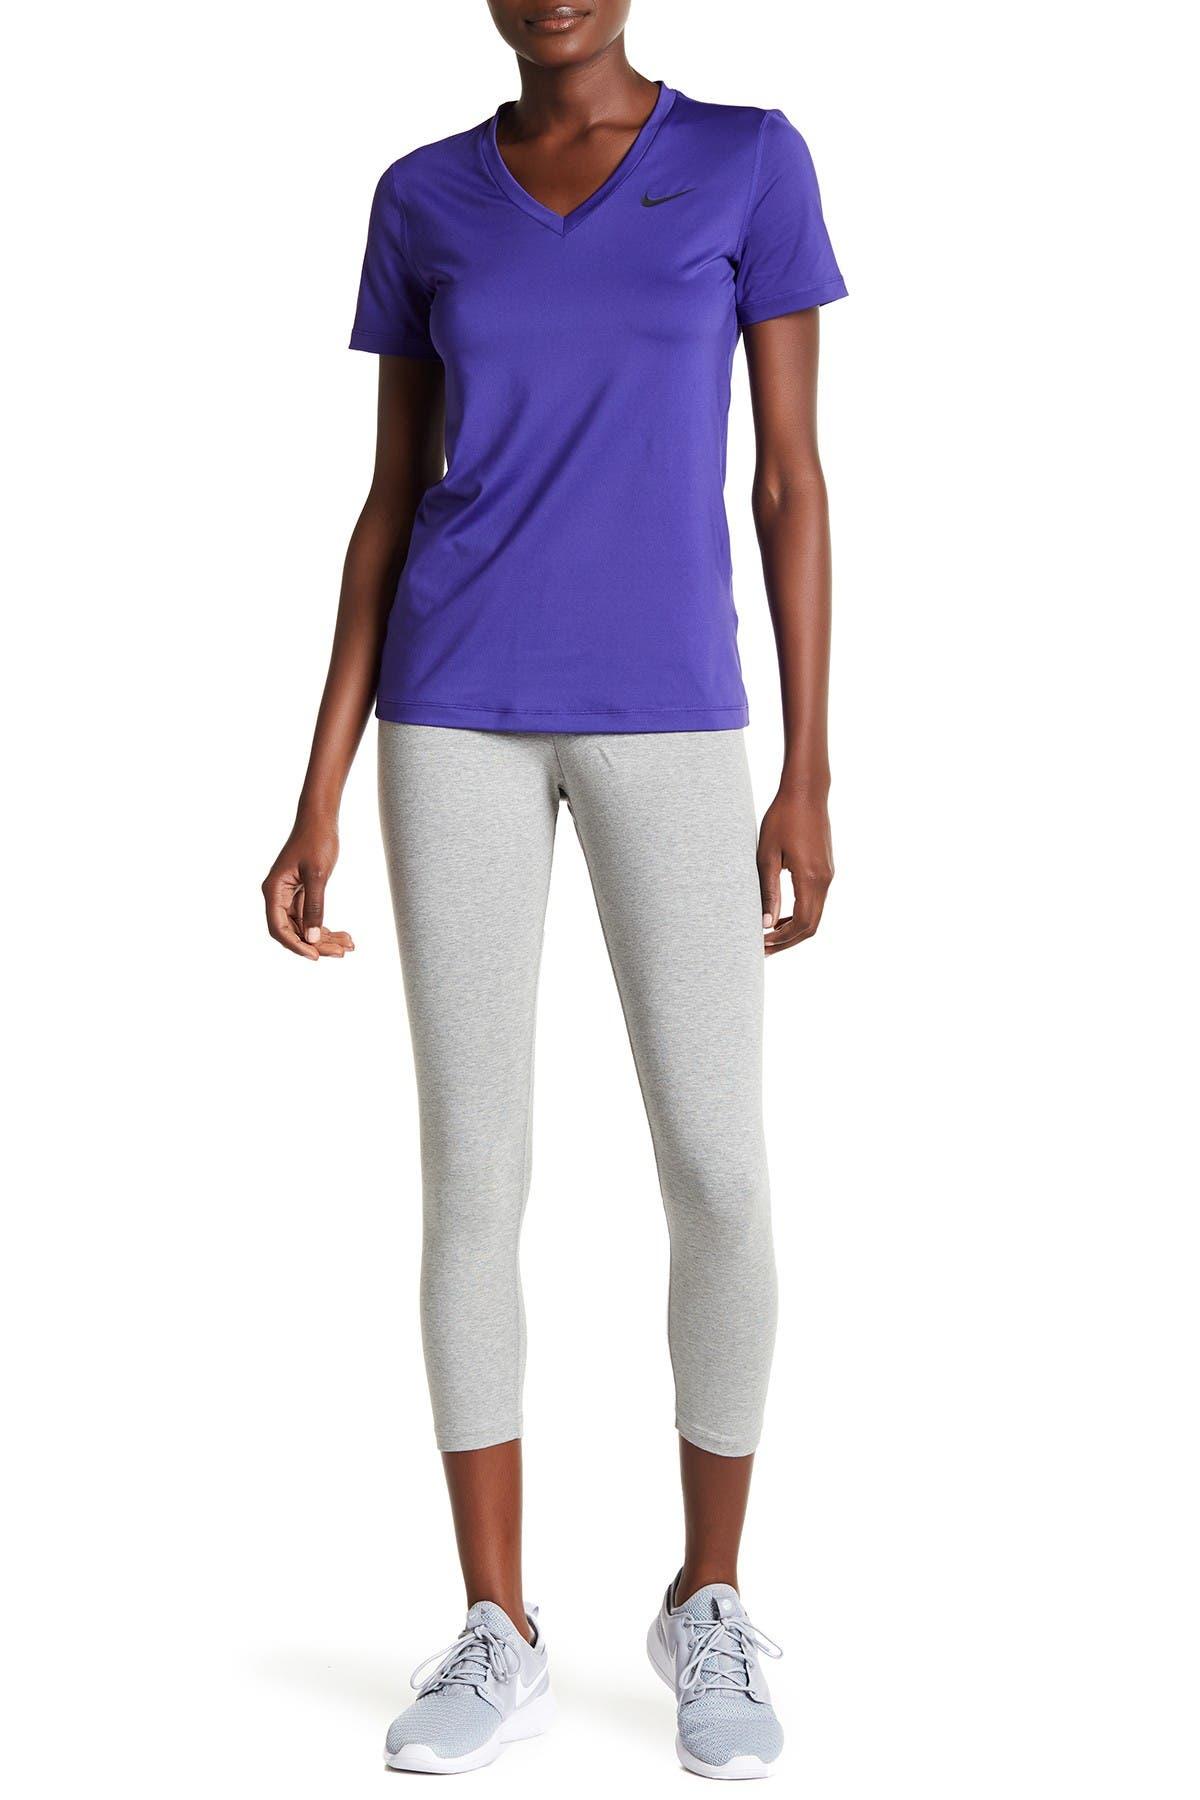 Image of Nike Club Futura Cropped Leggings